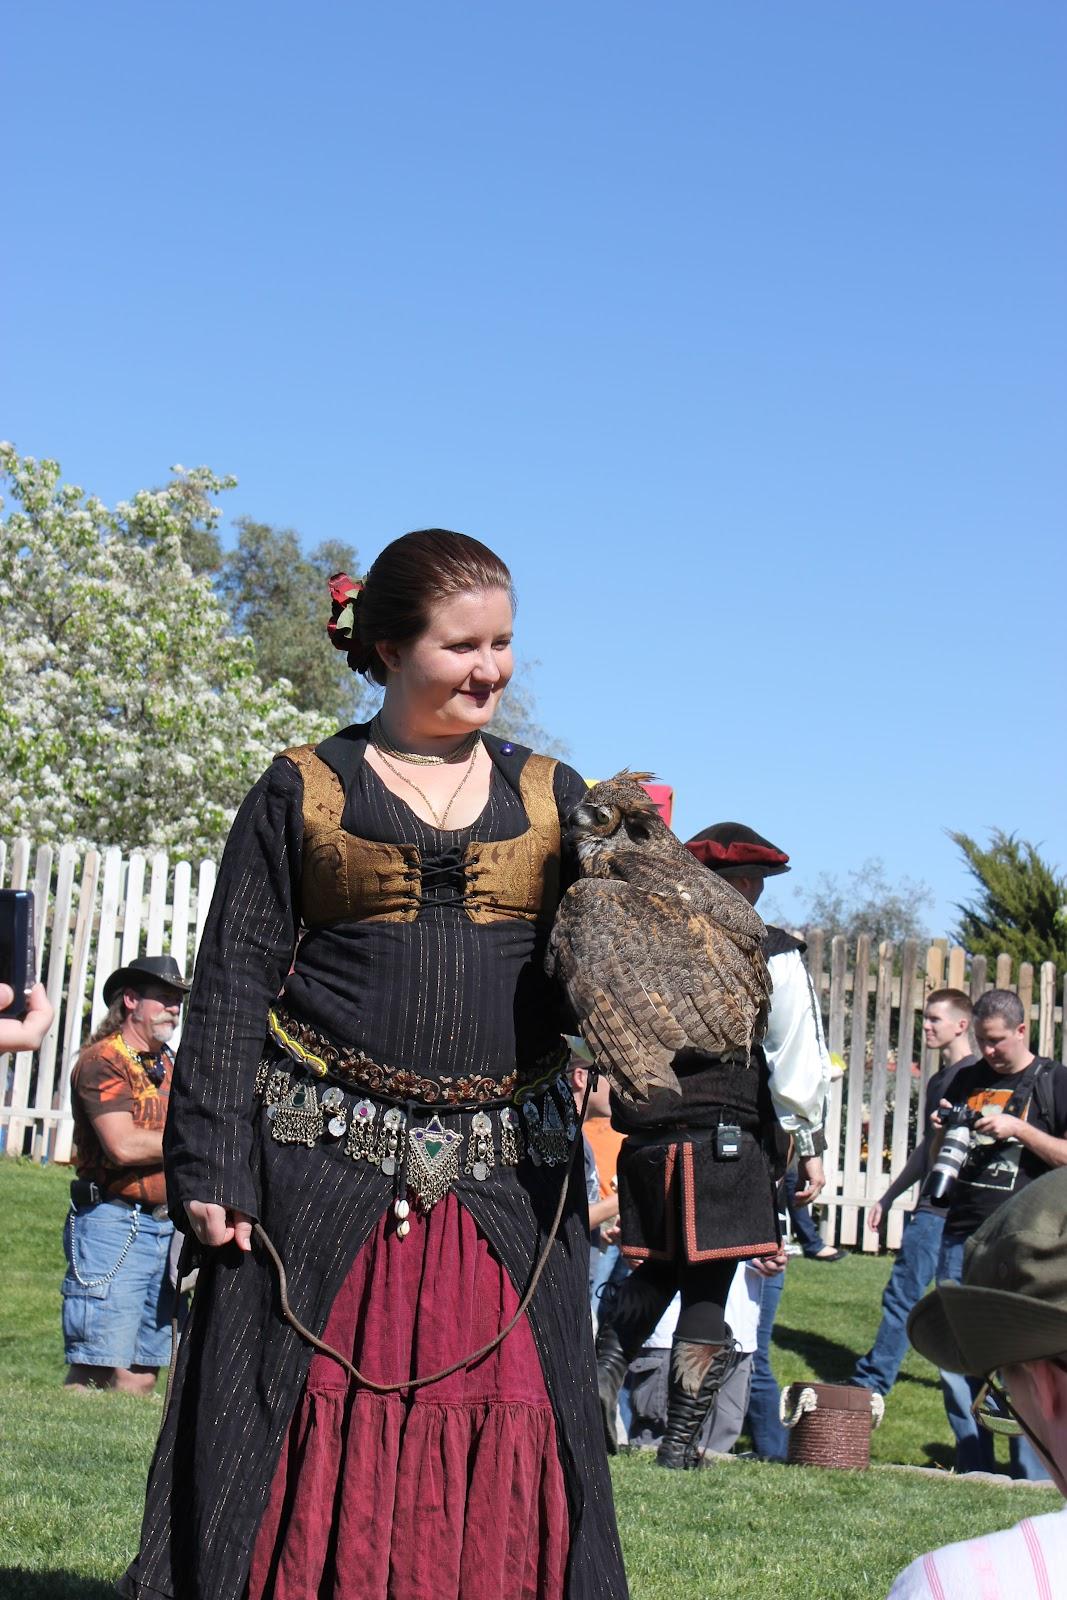 Renaissance festival dates in Perth